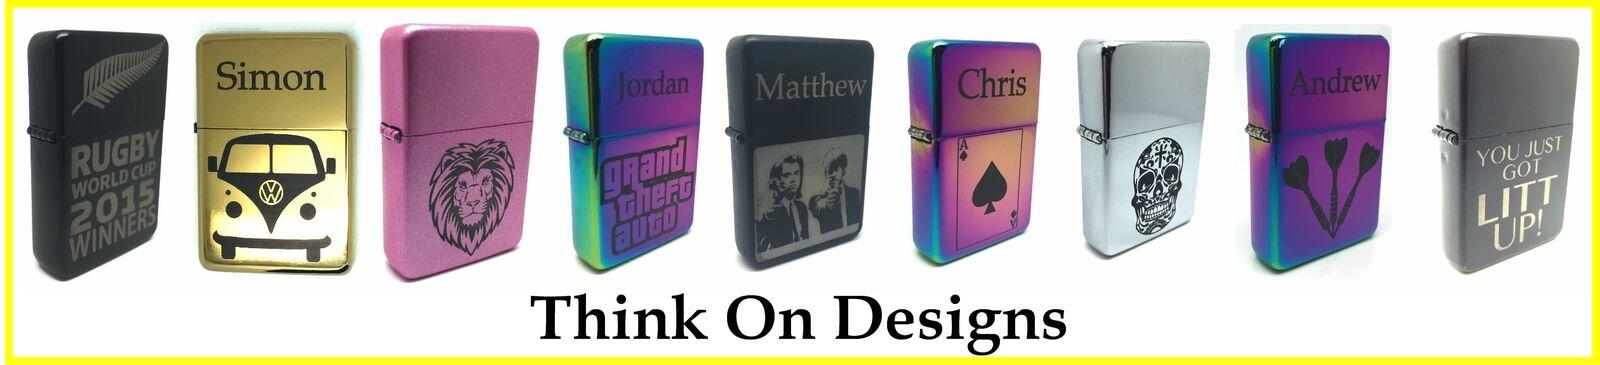 Think On Designs